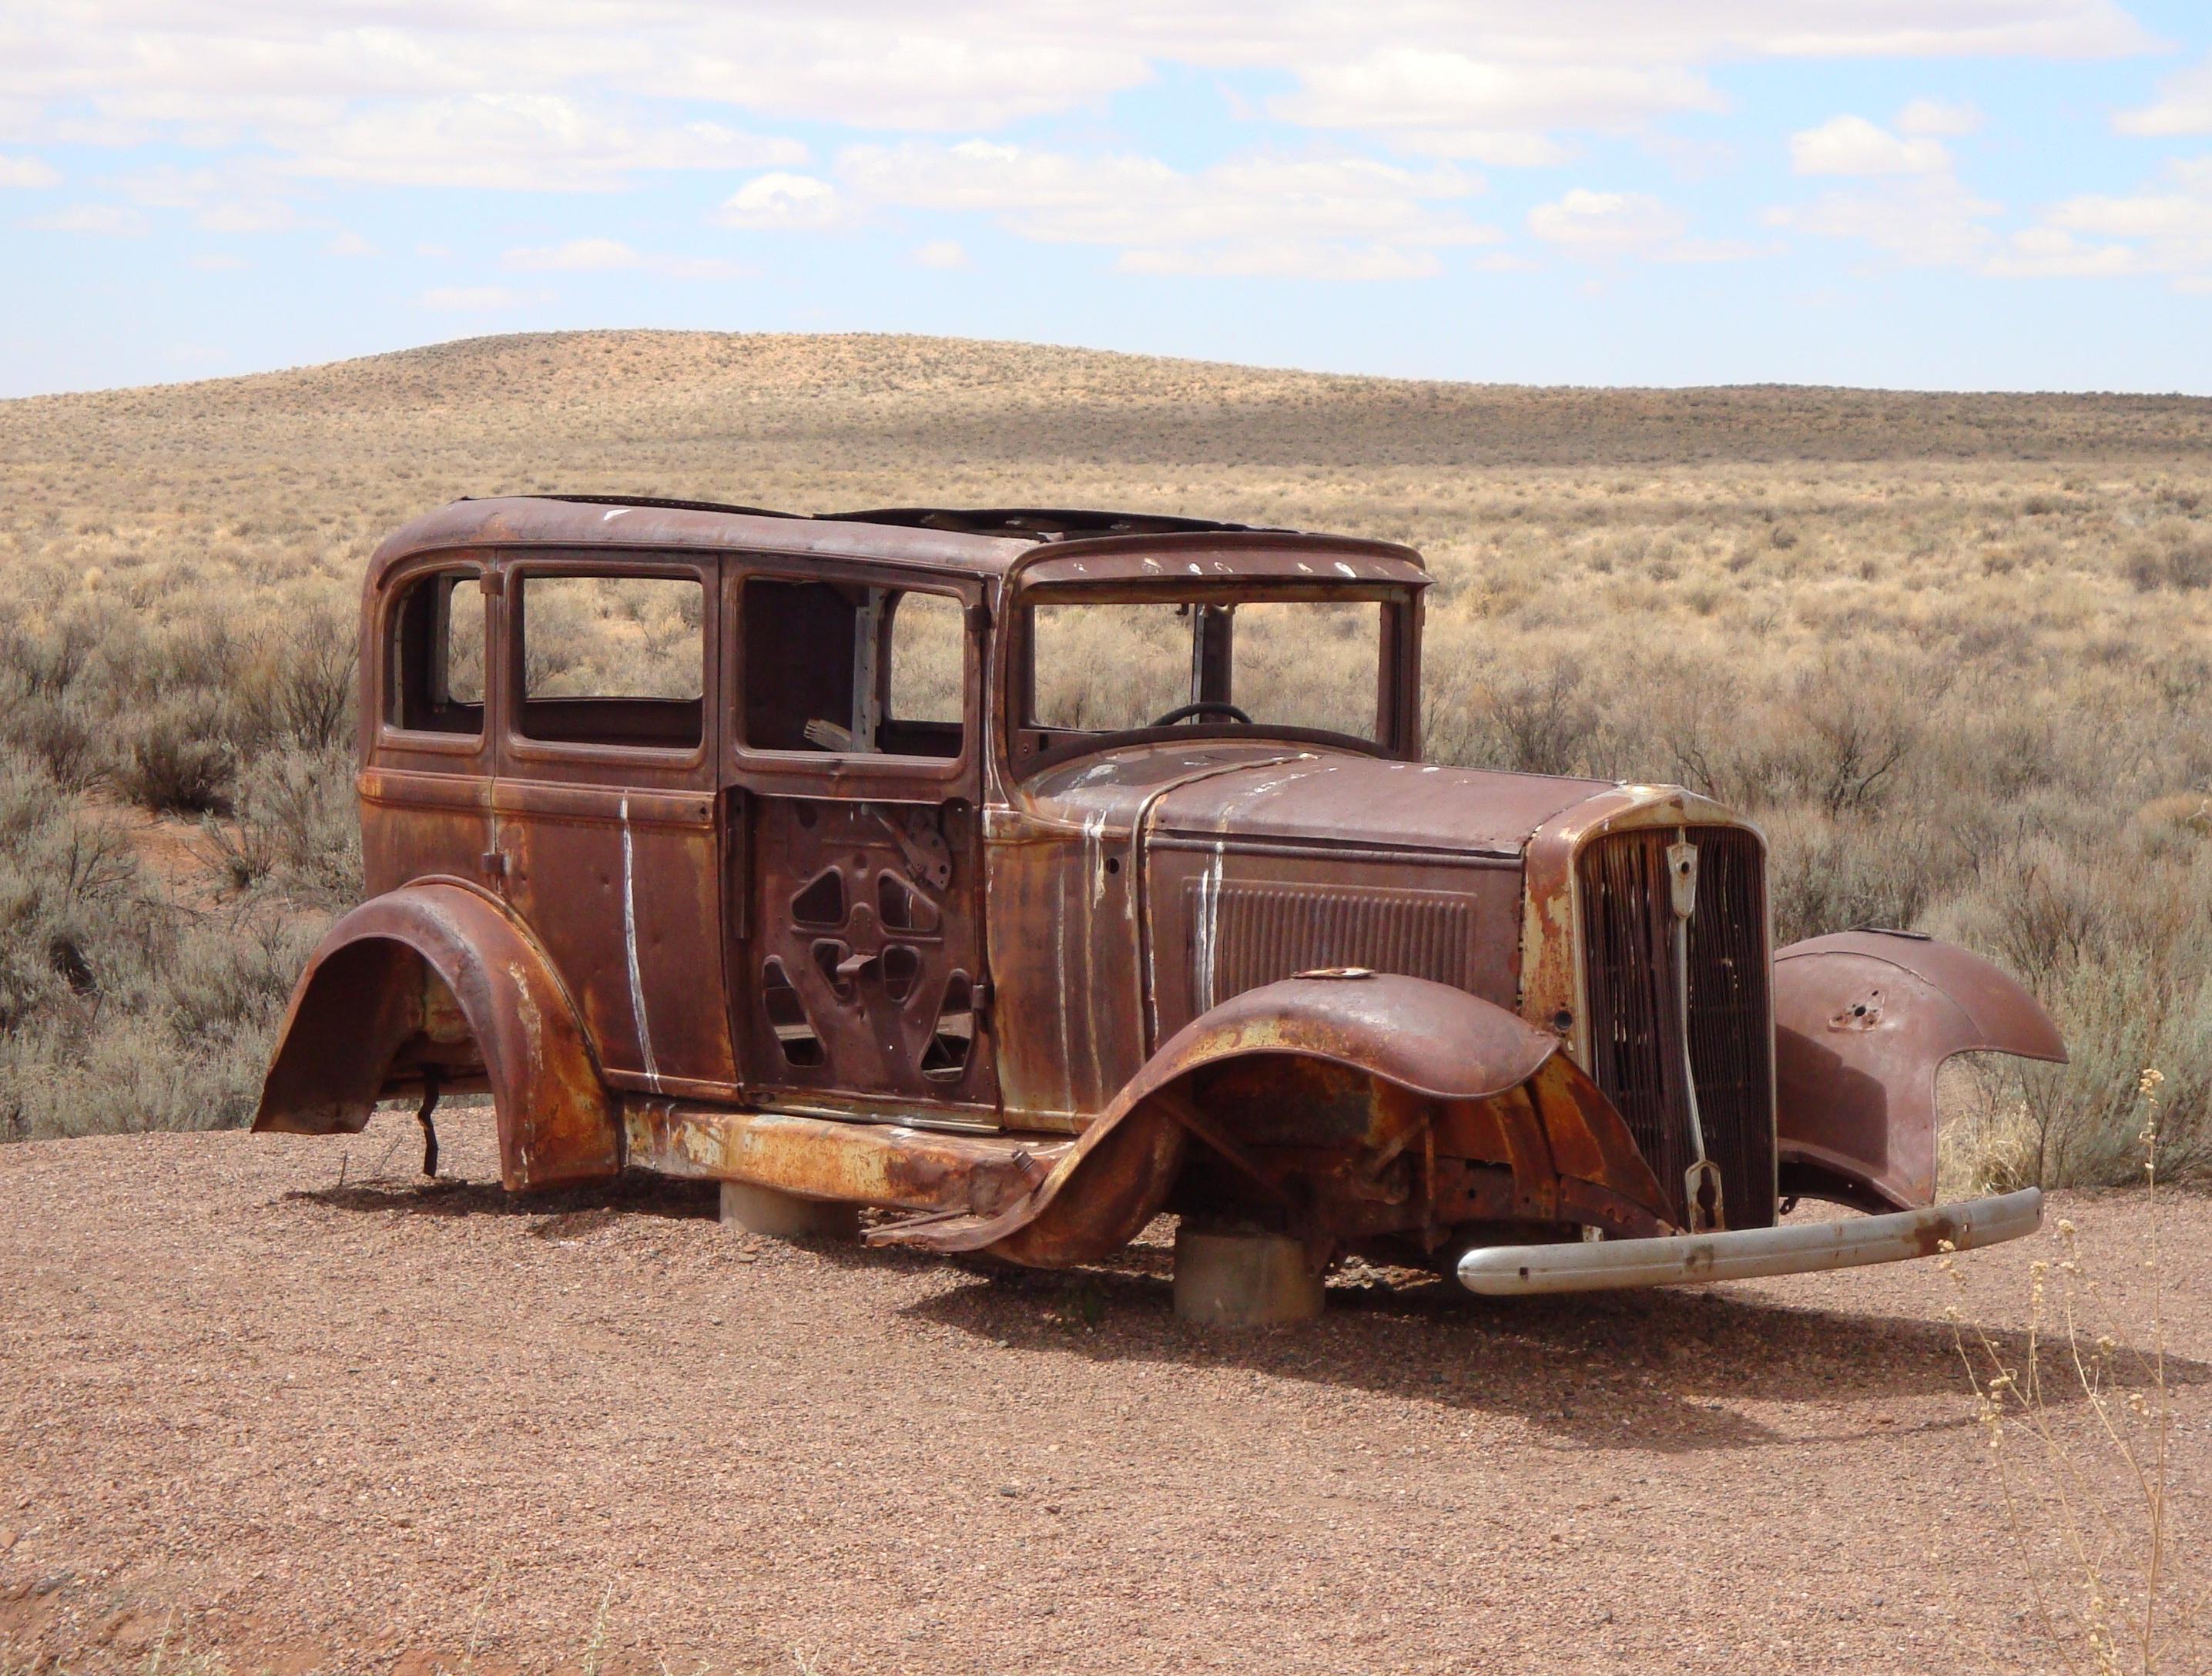 Free Images : retro, transport, rust, truck, old car, classic car ...